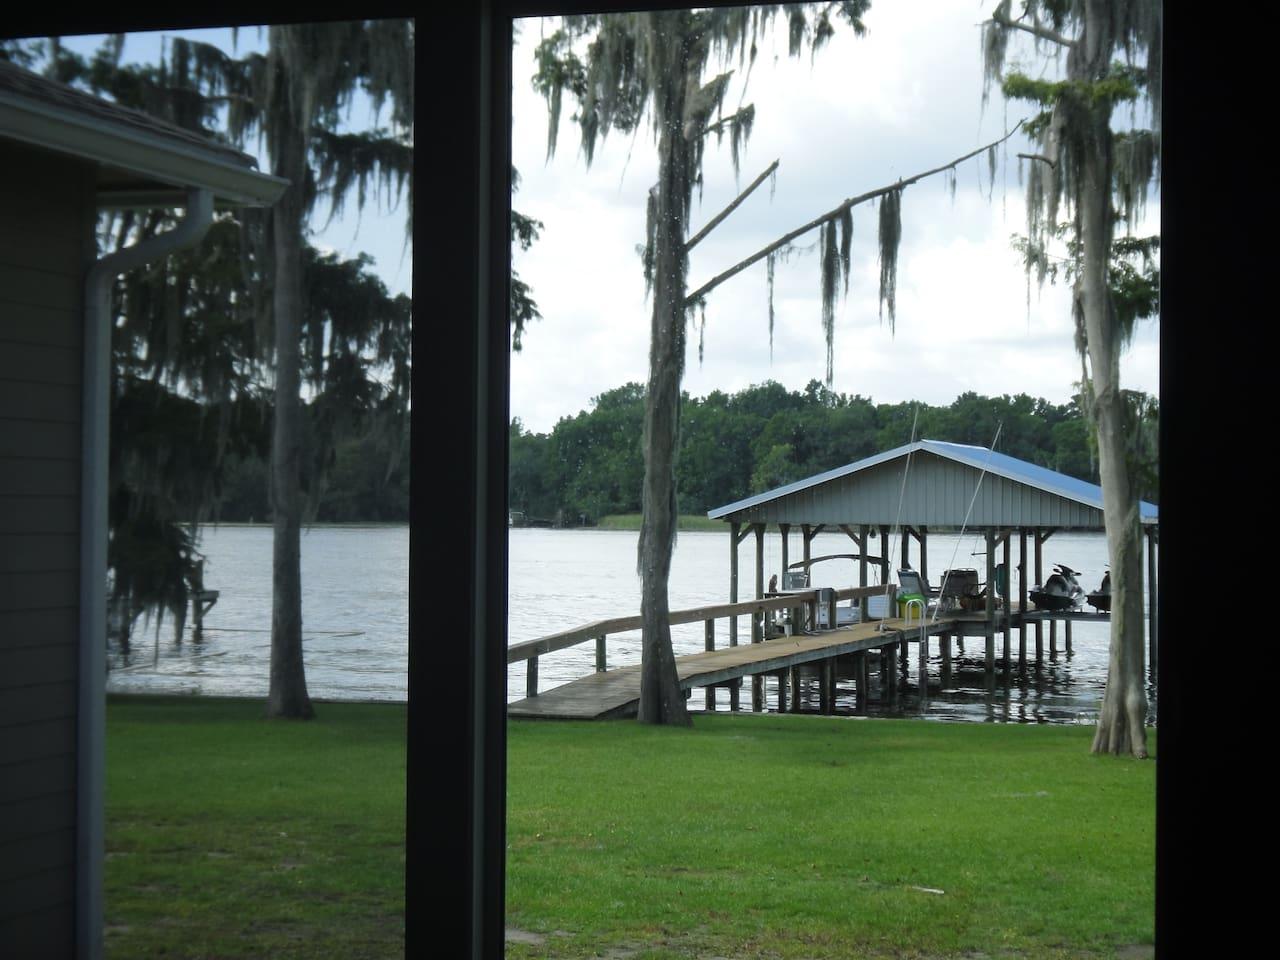 Oversized covered dock on river